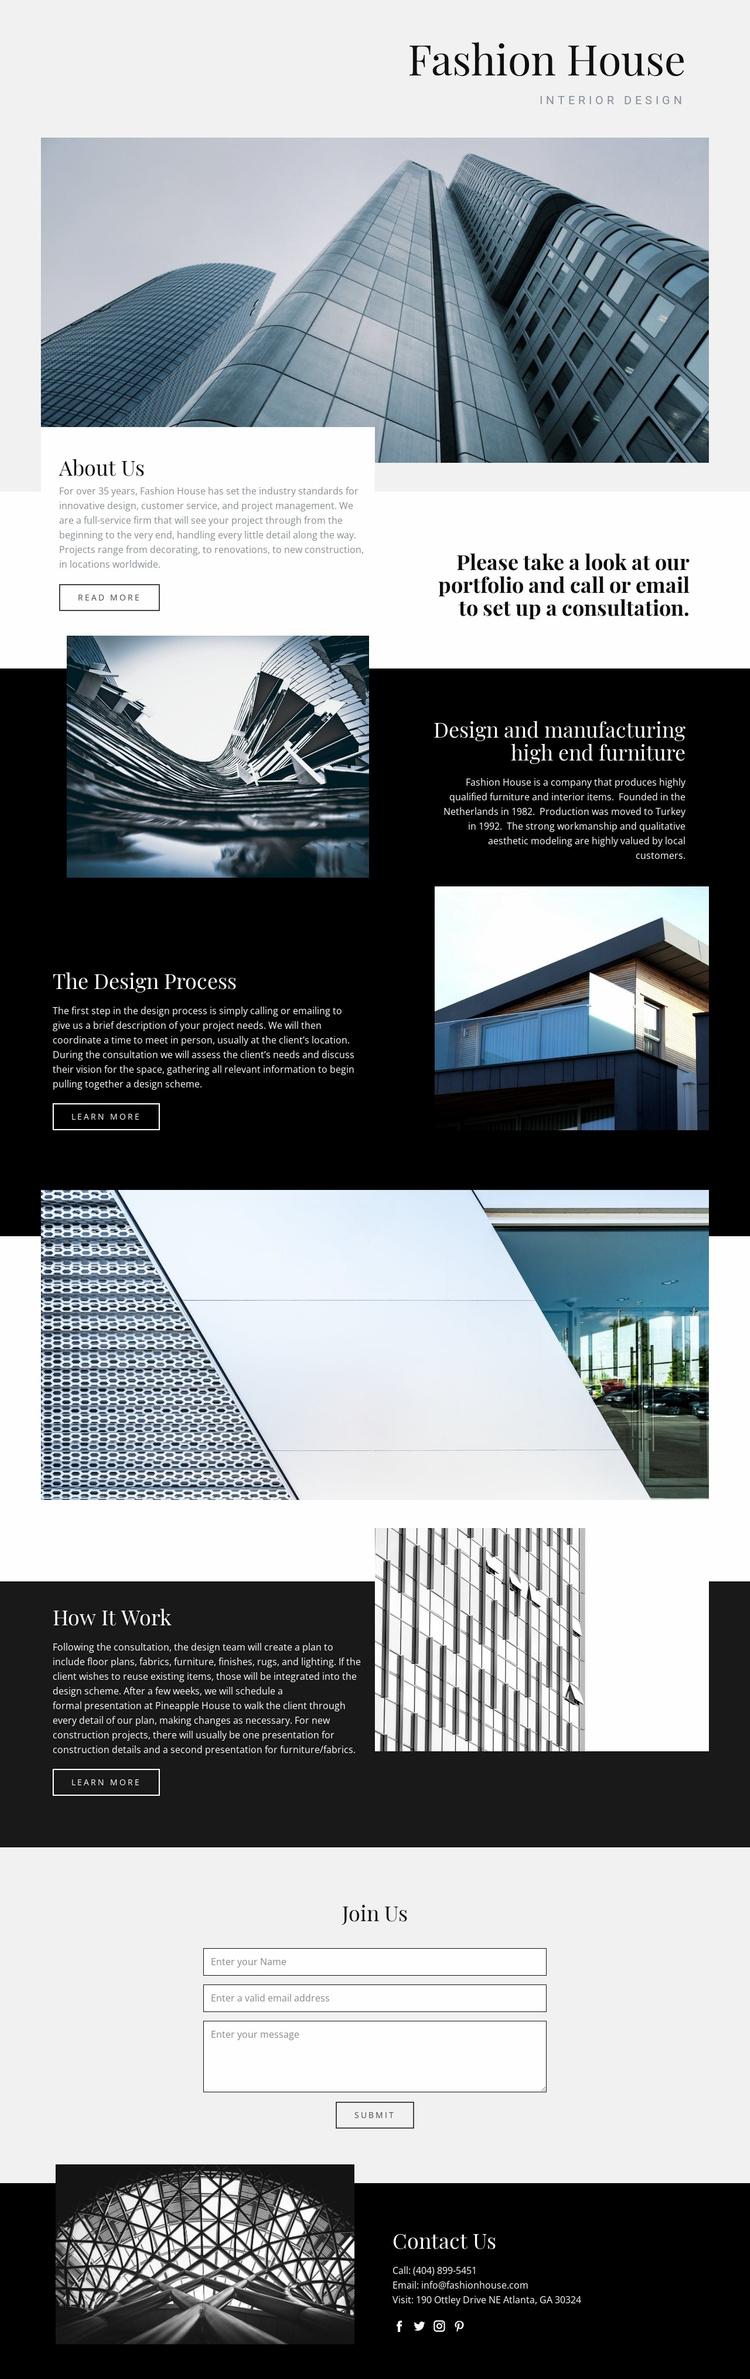 Fashion House Landing Page